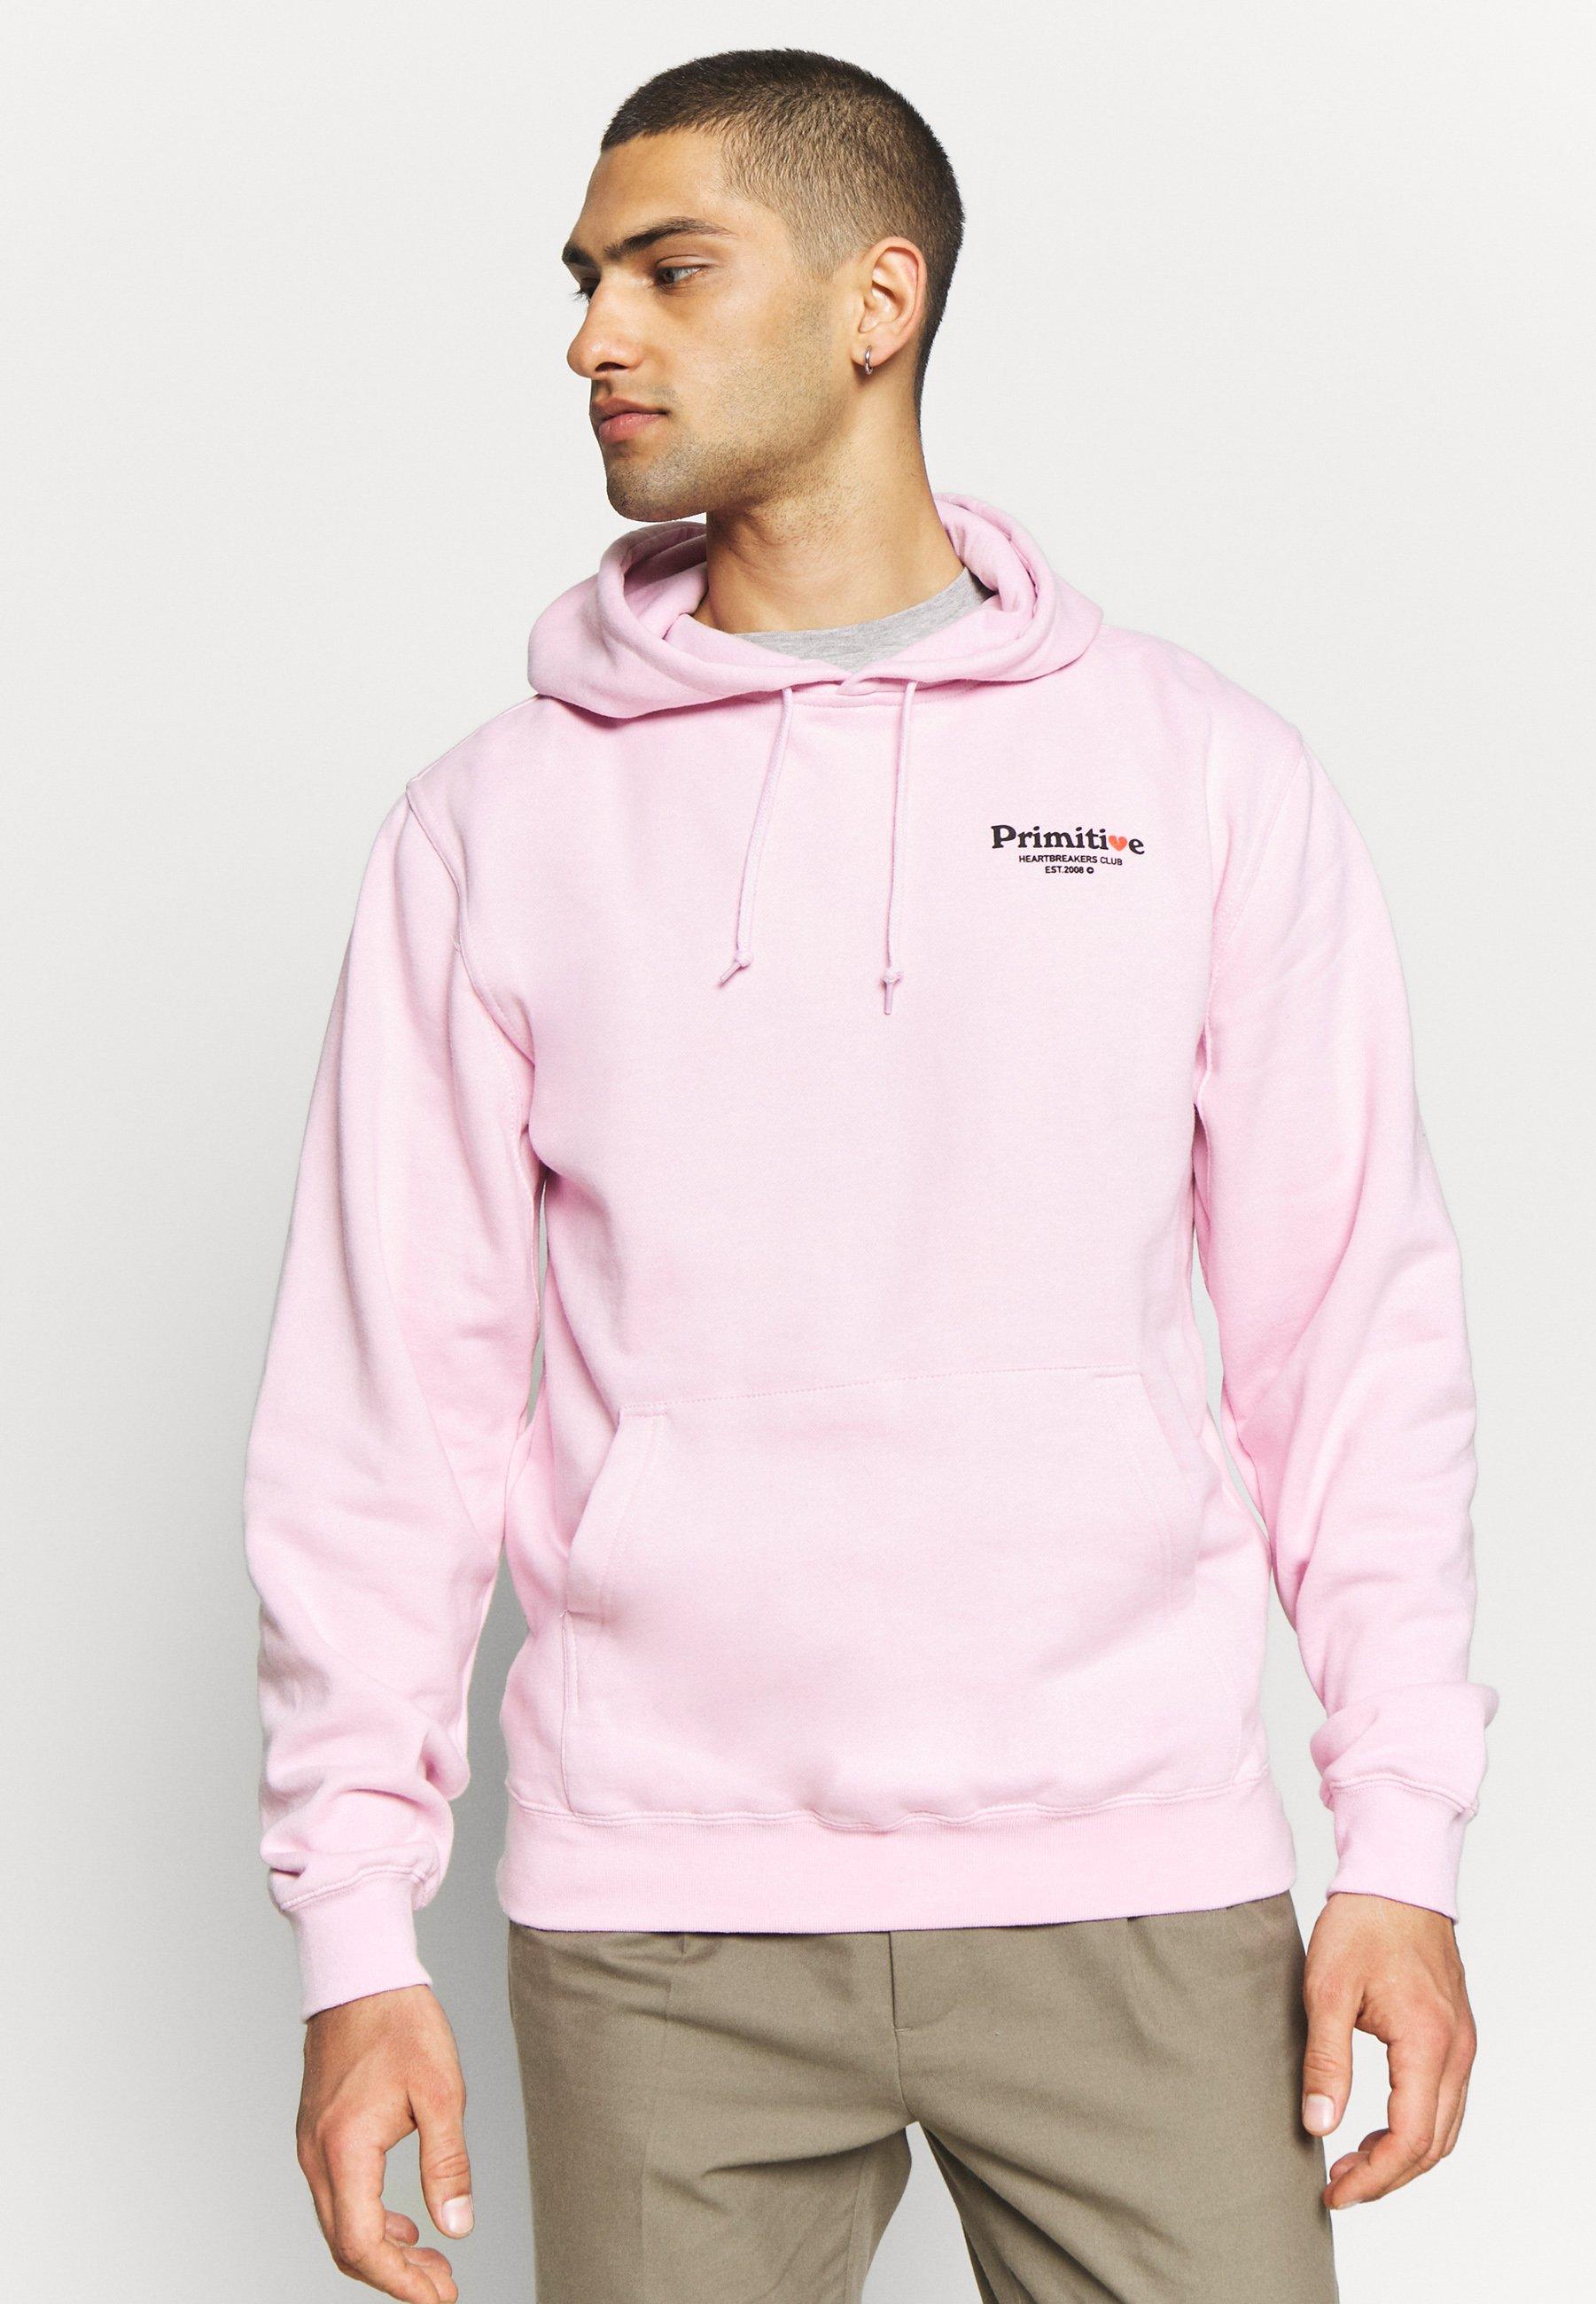 2020 Alennus Miesten vaatteet Sarja dfKJIUp97454sfGHYHD Primitive DIRTY CUPID HOOD Huppari pink